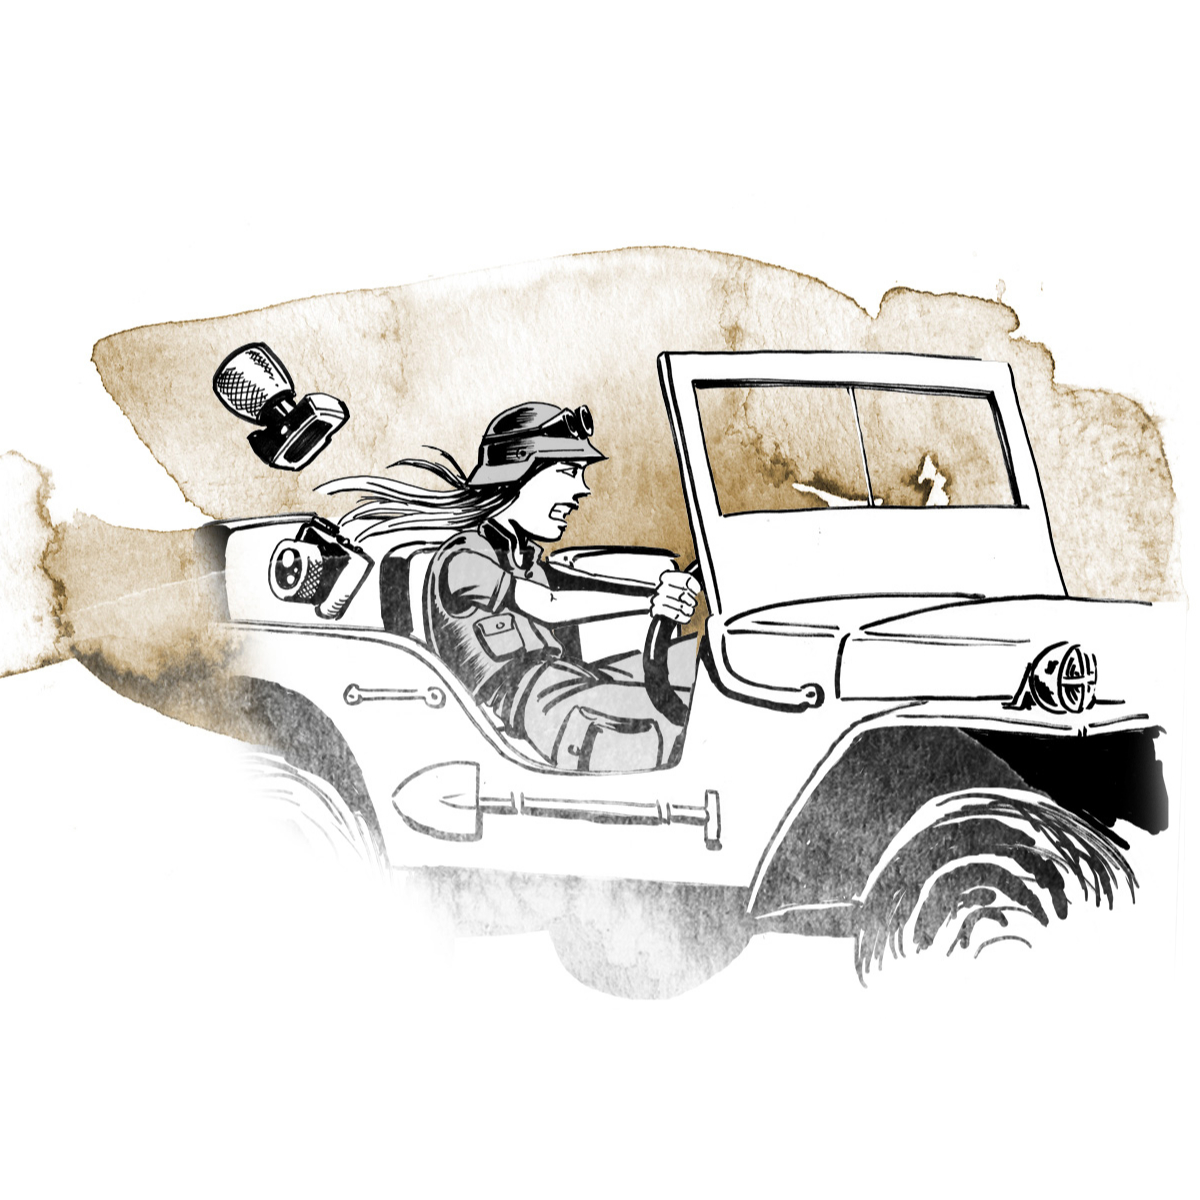 06-pille-girl-jeep-journalism-foto.jpg